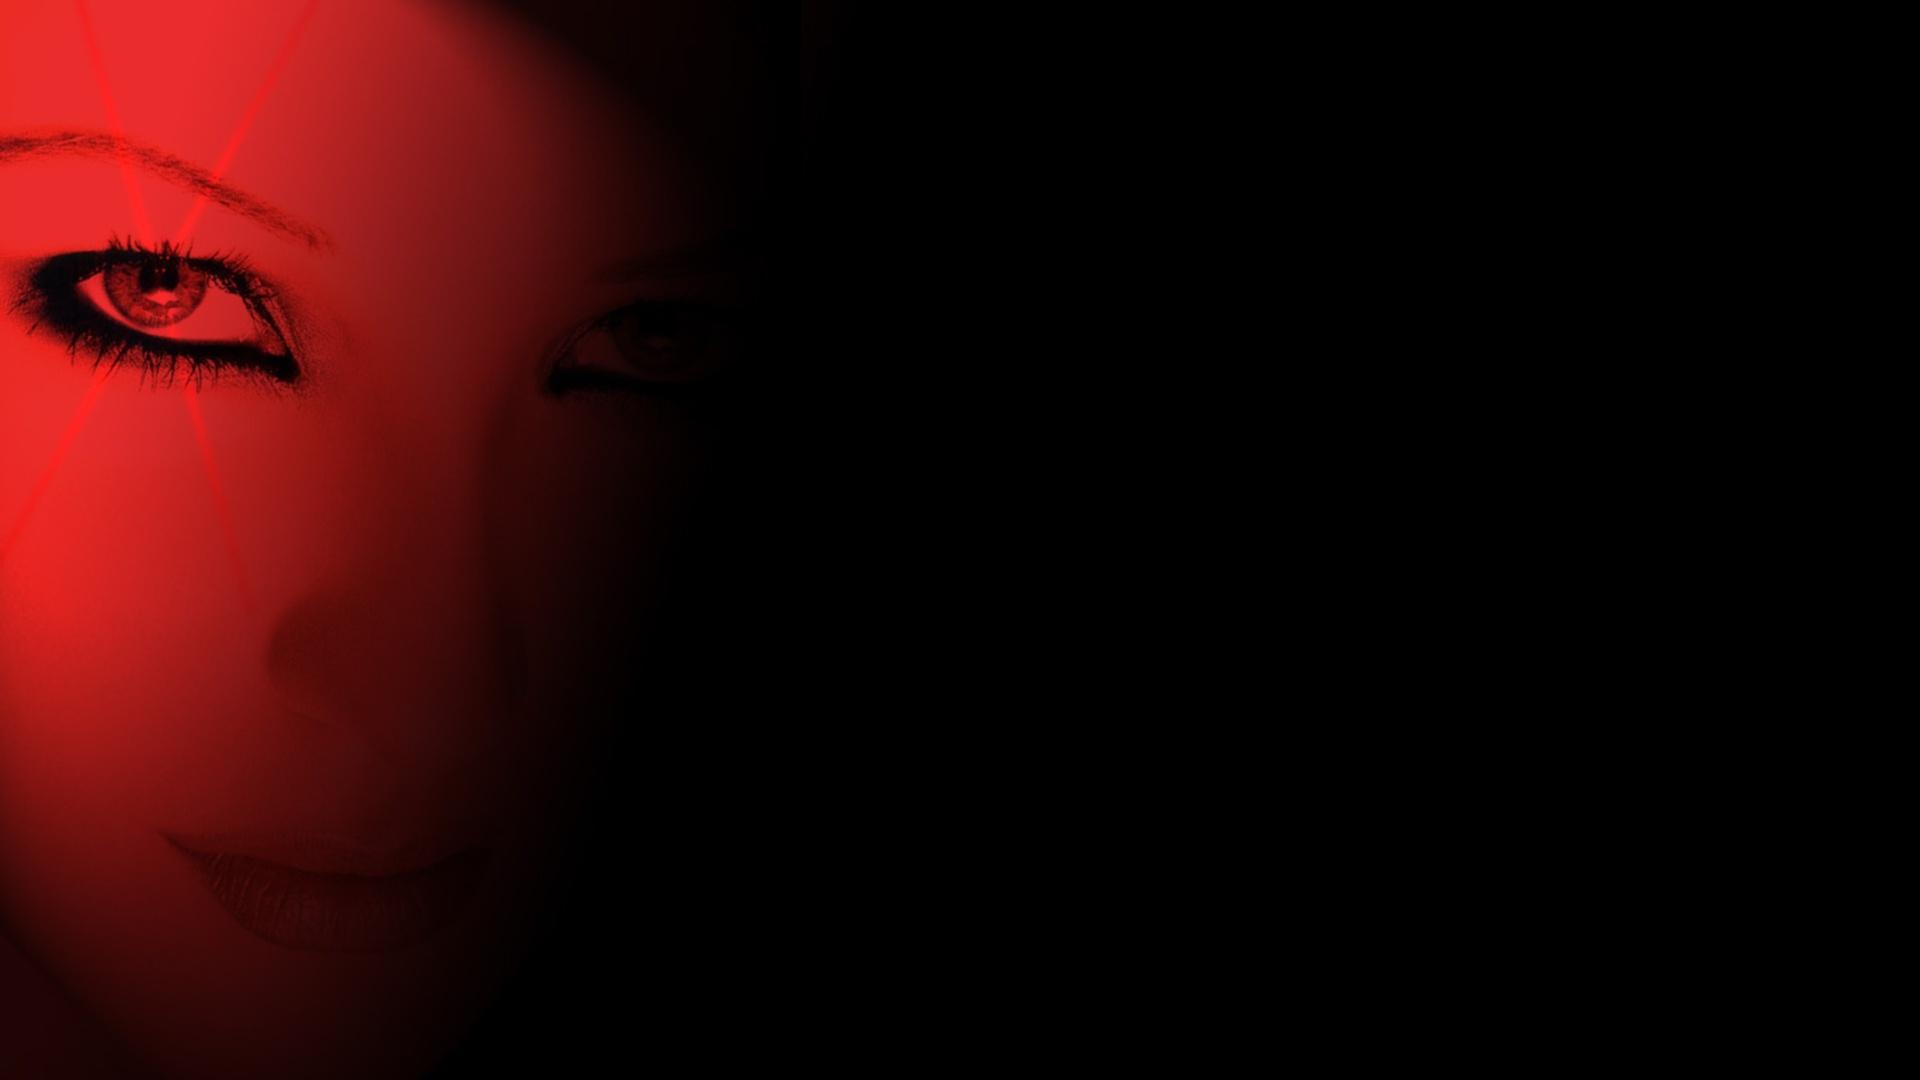 73 736096 black wallpaper 1080p 1080p black and red